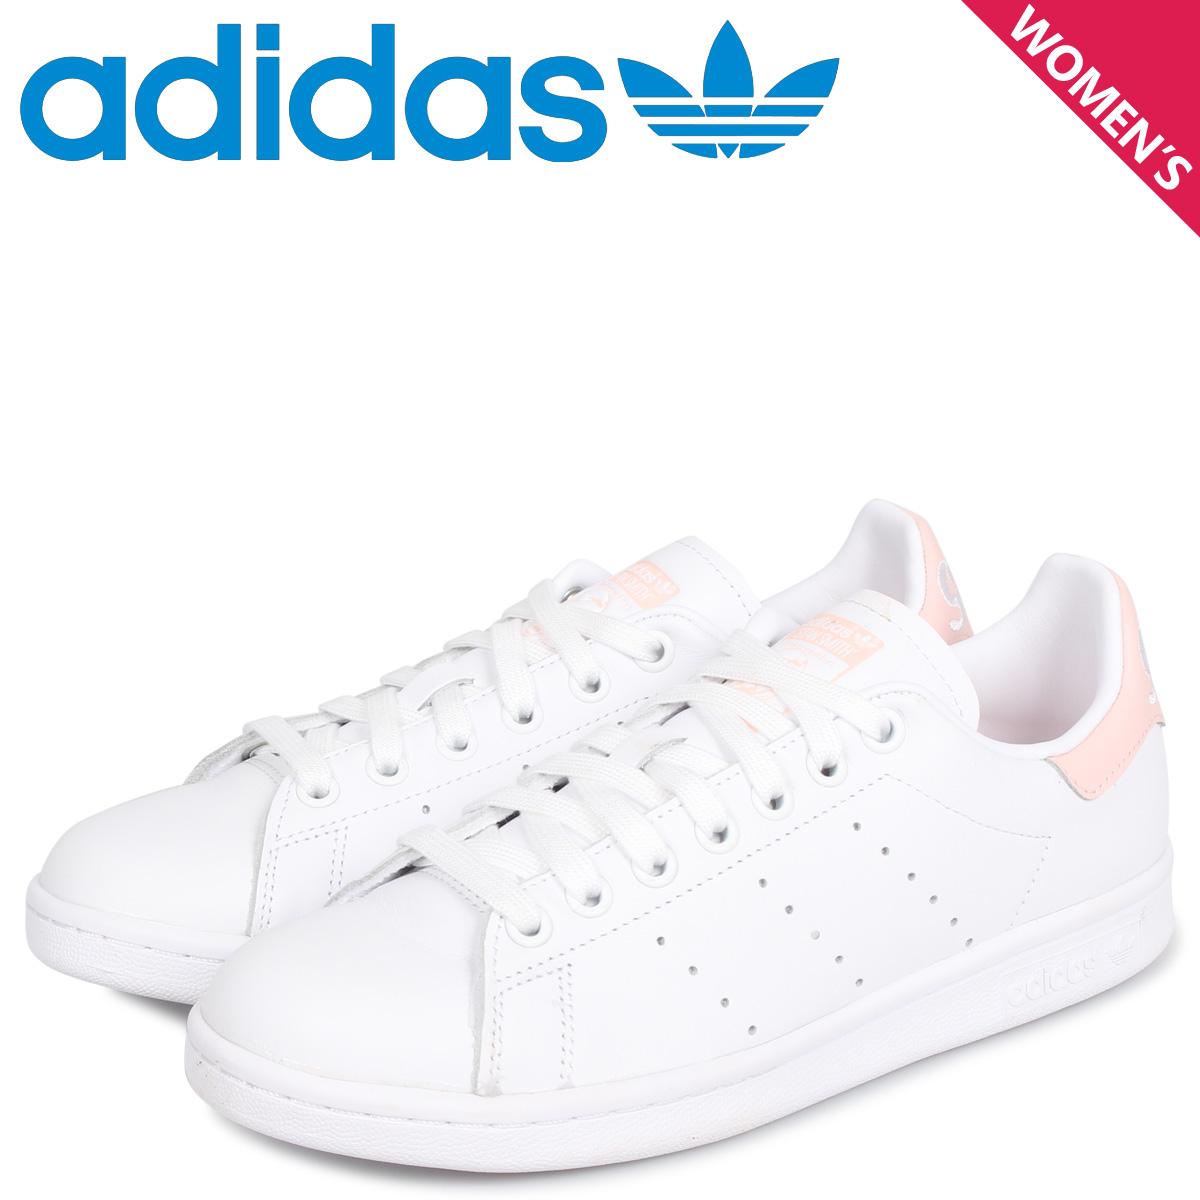 adidas Originals アディダス オリジナルス スタンスミス スニーカー レディース STAN SMITH W ホワイト 白 EE5865